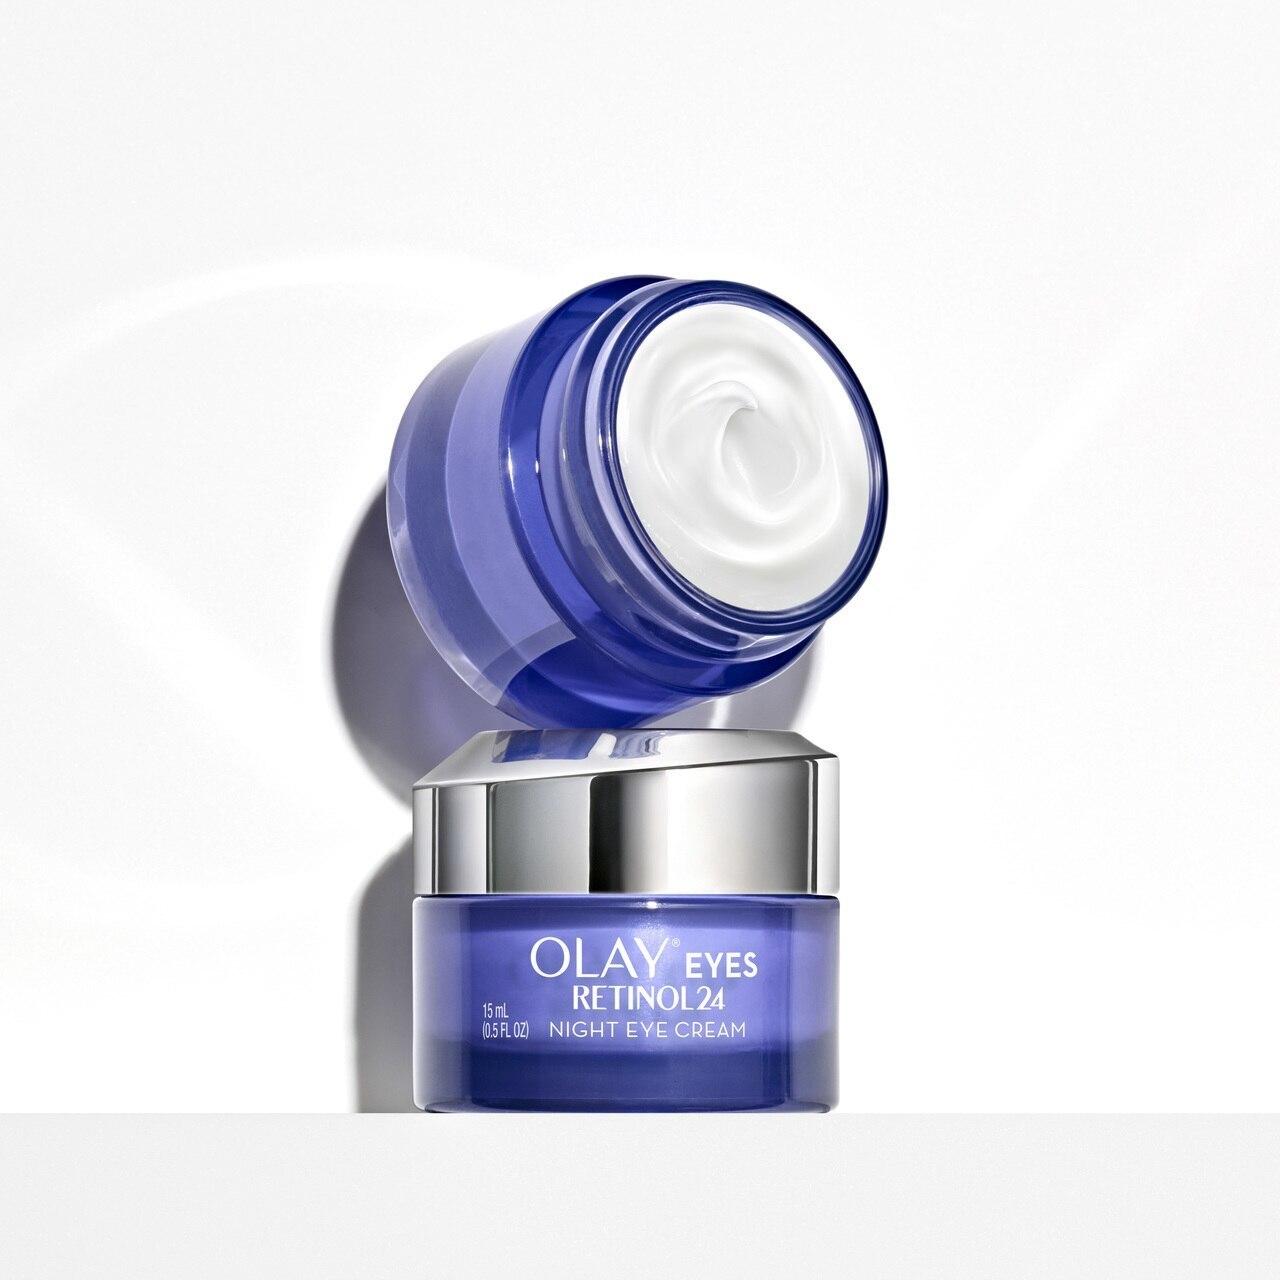 olay regenerist retinol 24 eye cream, best retinol eye cream